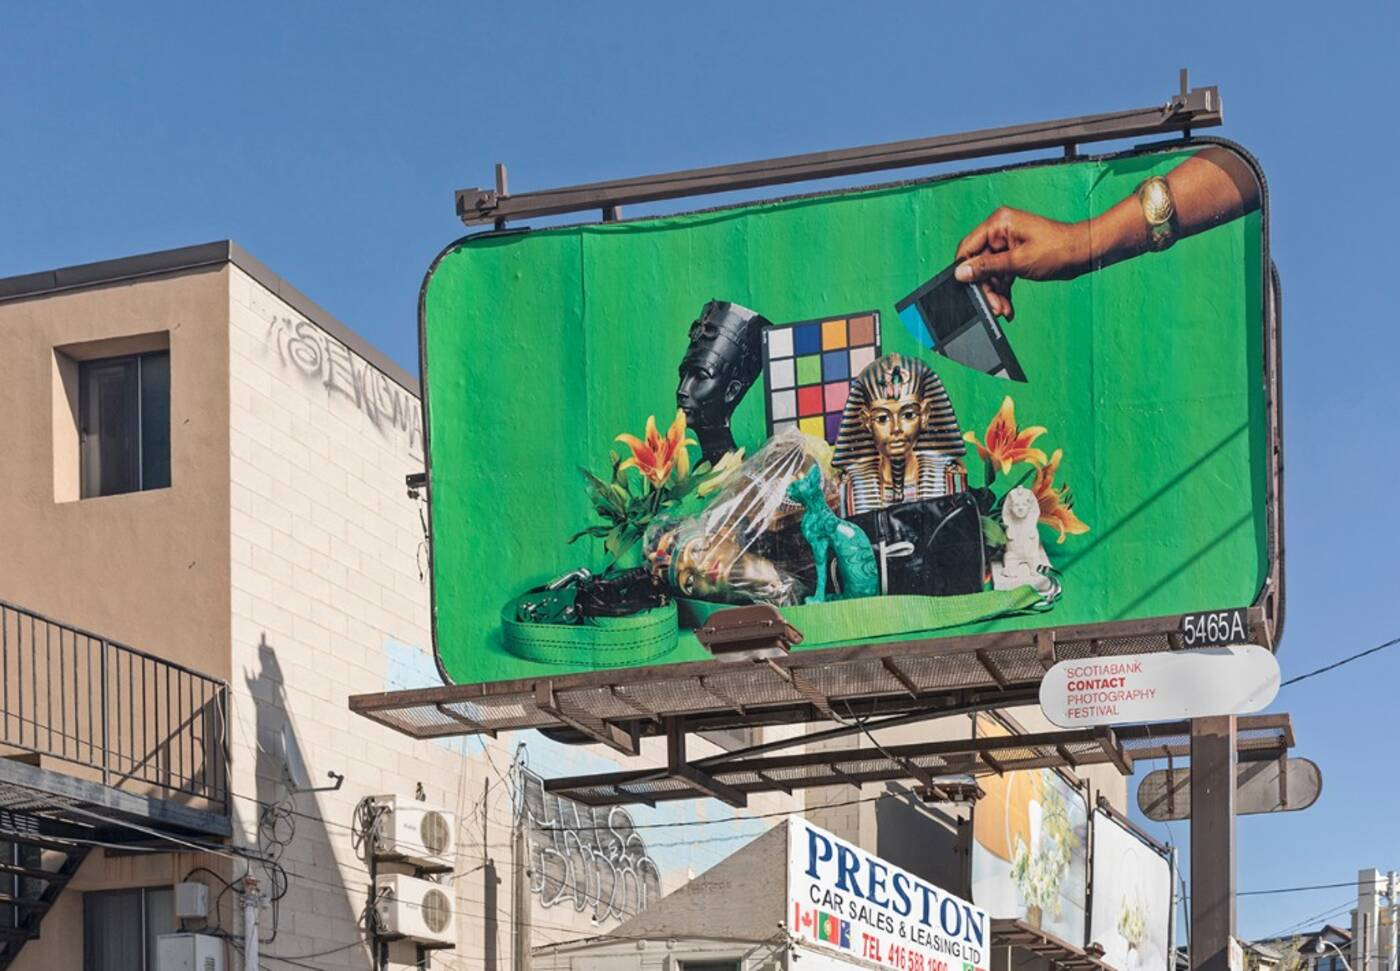 contact festival billboards